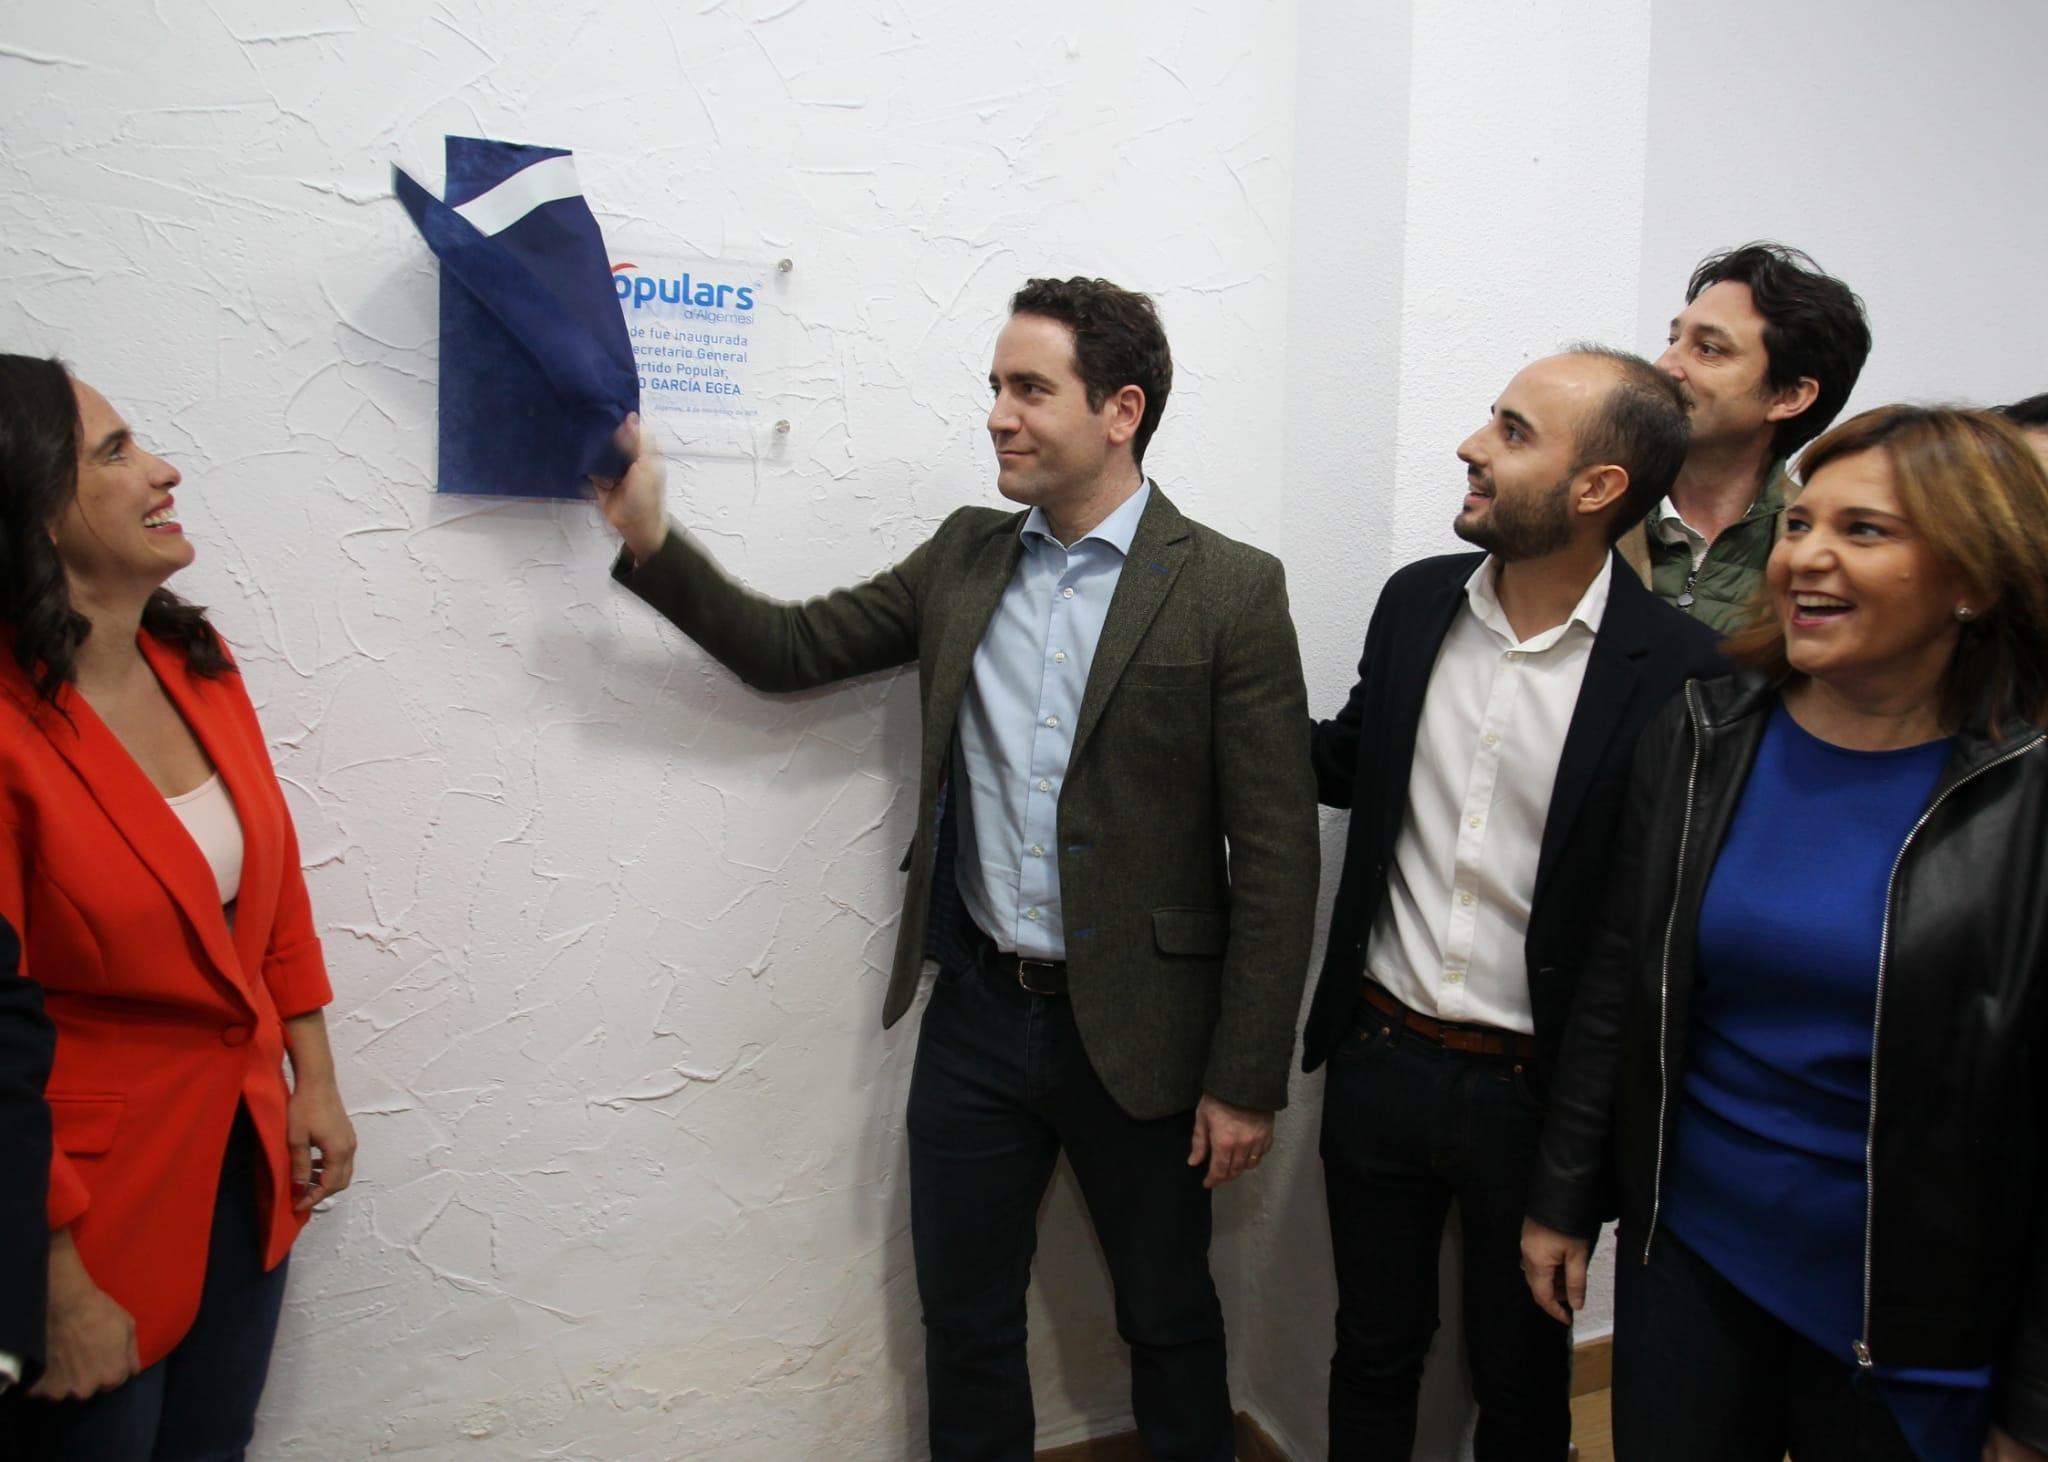 leopoldo garcia egea jose javier sanchis isabel bonig belen hoyo agencia prensa2 moises castell